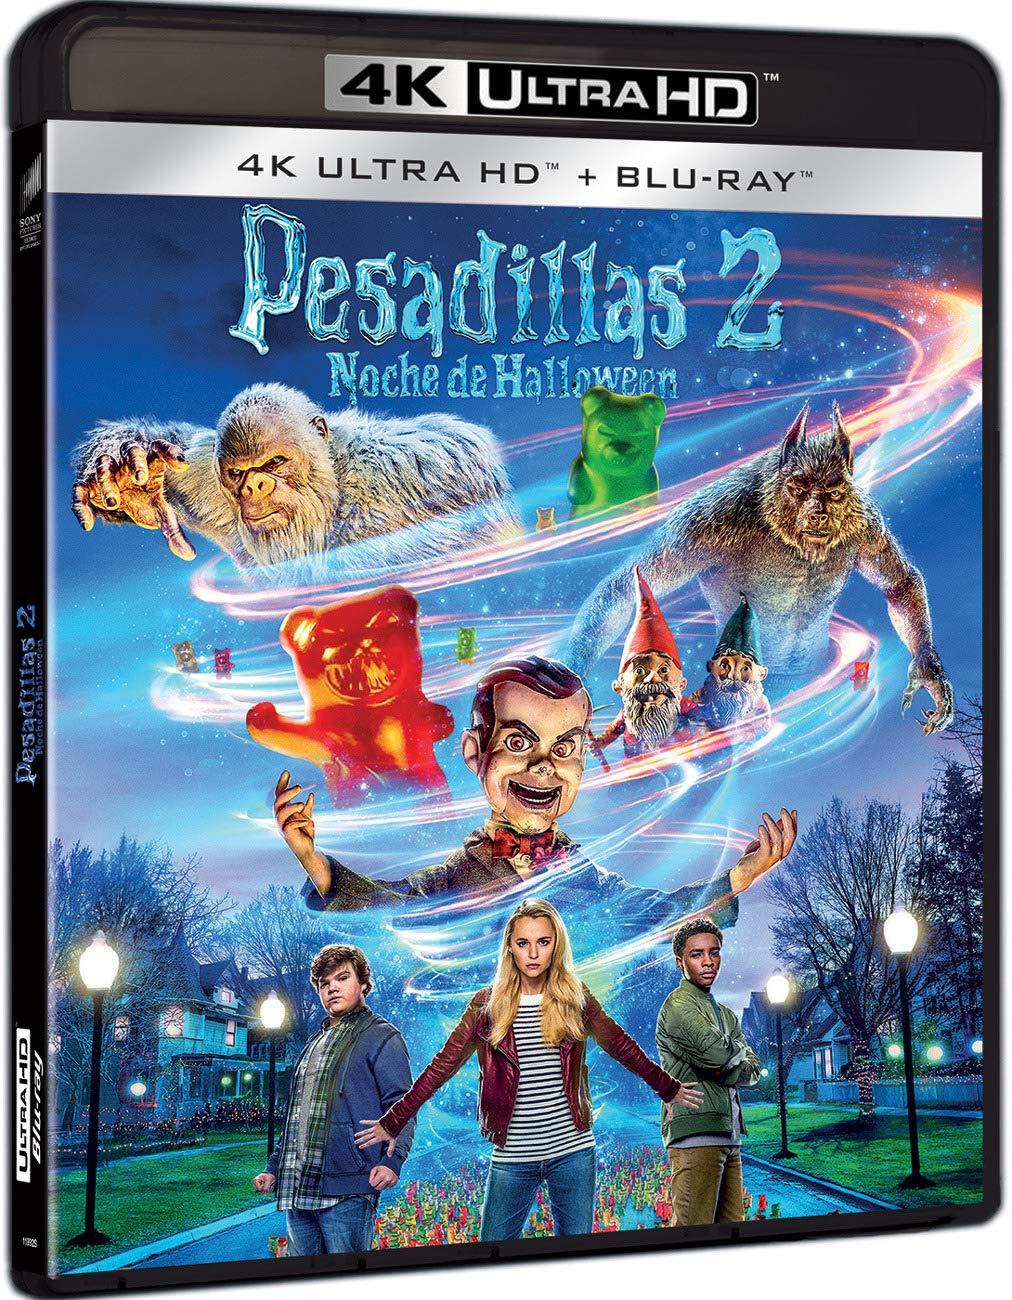 Pesadillas 2: Noche De Halloween 4K UHD + BD Blu-ray: Amazon.es: Wendi Mclendon-Covey, Madison Iseman, Jeremy Ray Taylor, Ari Sandel, Wendi Mclendon-Covey, Madison Iseman, Columbia Pictures Corporation: Cine y Series TV